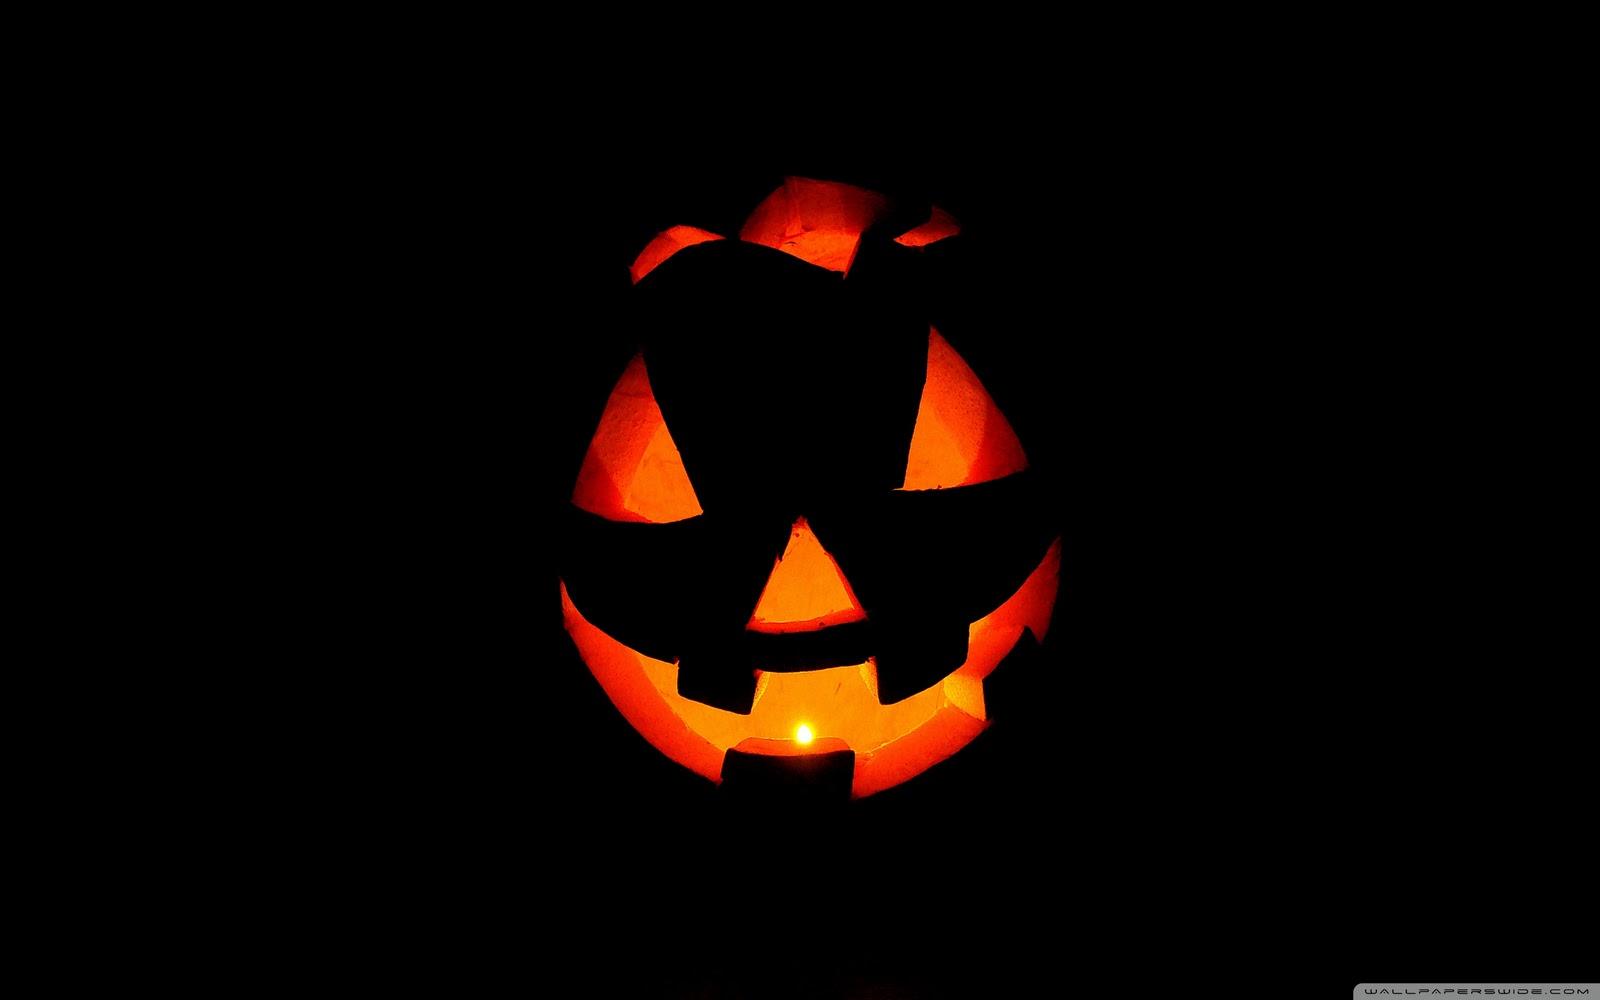 http://1.bp.blogspot.com/-PjrV_RKDnJk/Tq4bqCmGYqI/AAAAAAAAGrk/xXkk-iaA4Io/s1600/halloween_pumpkin_art_2-wallpaper-2560x1600.jpg